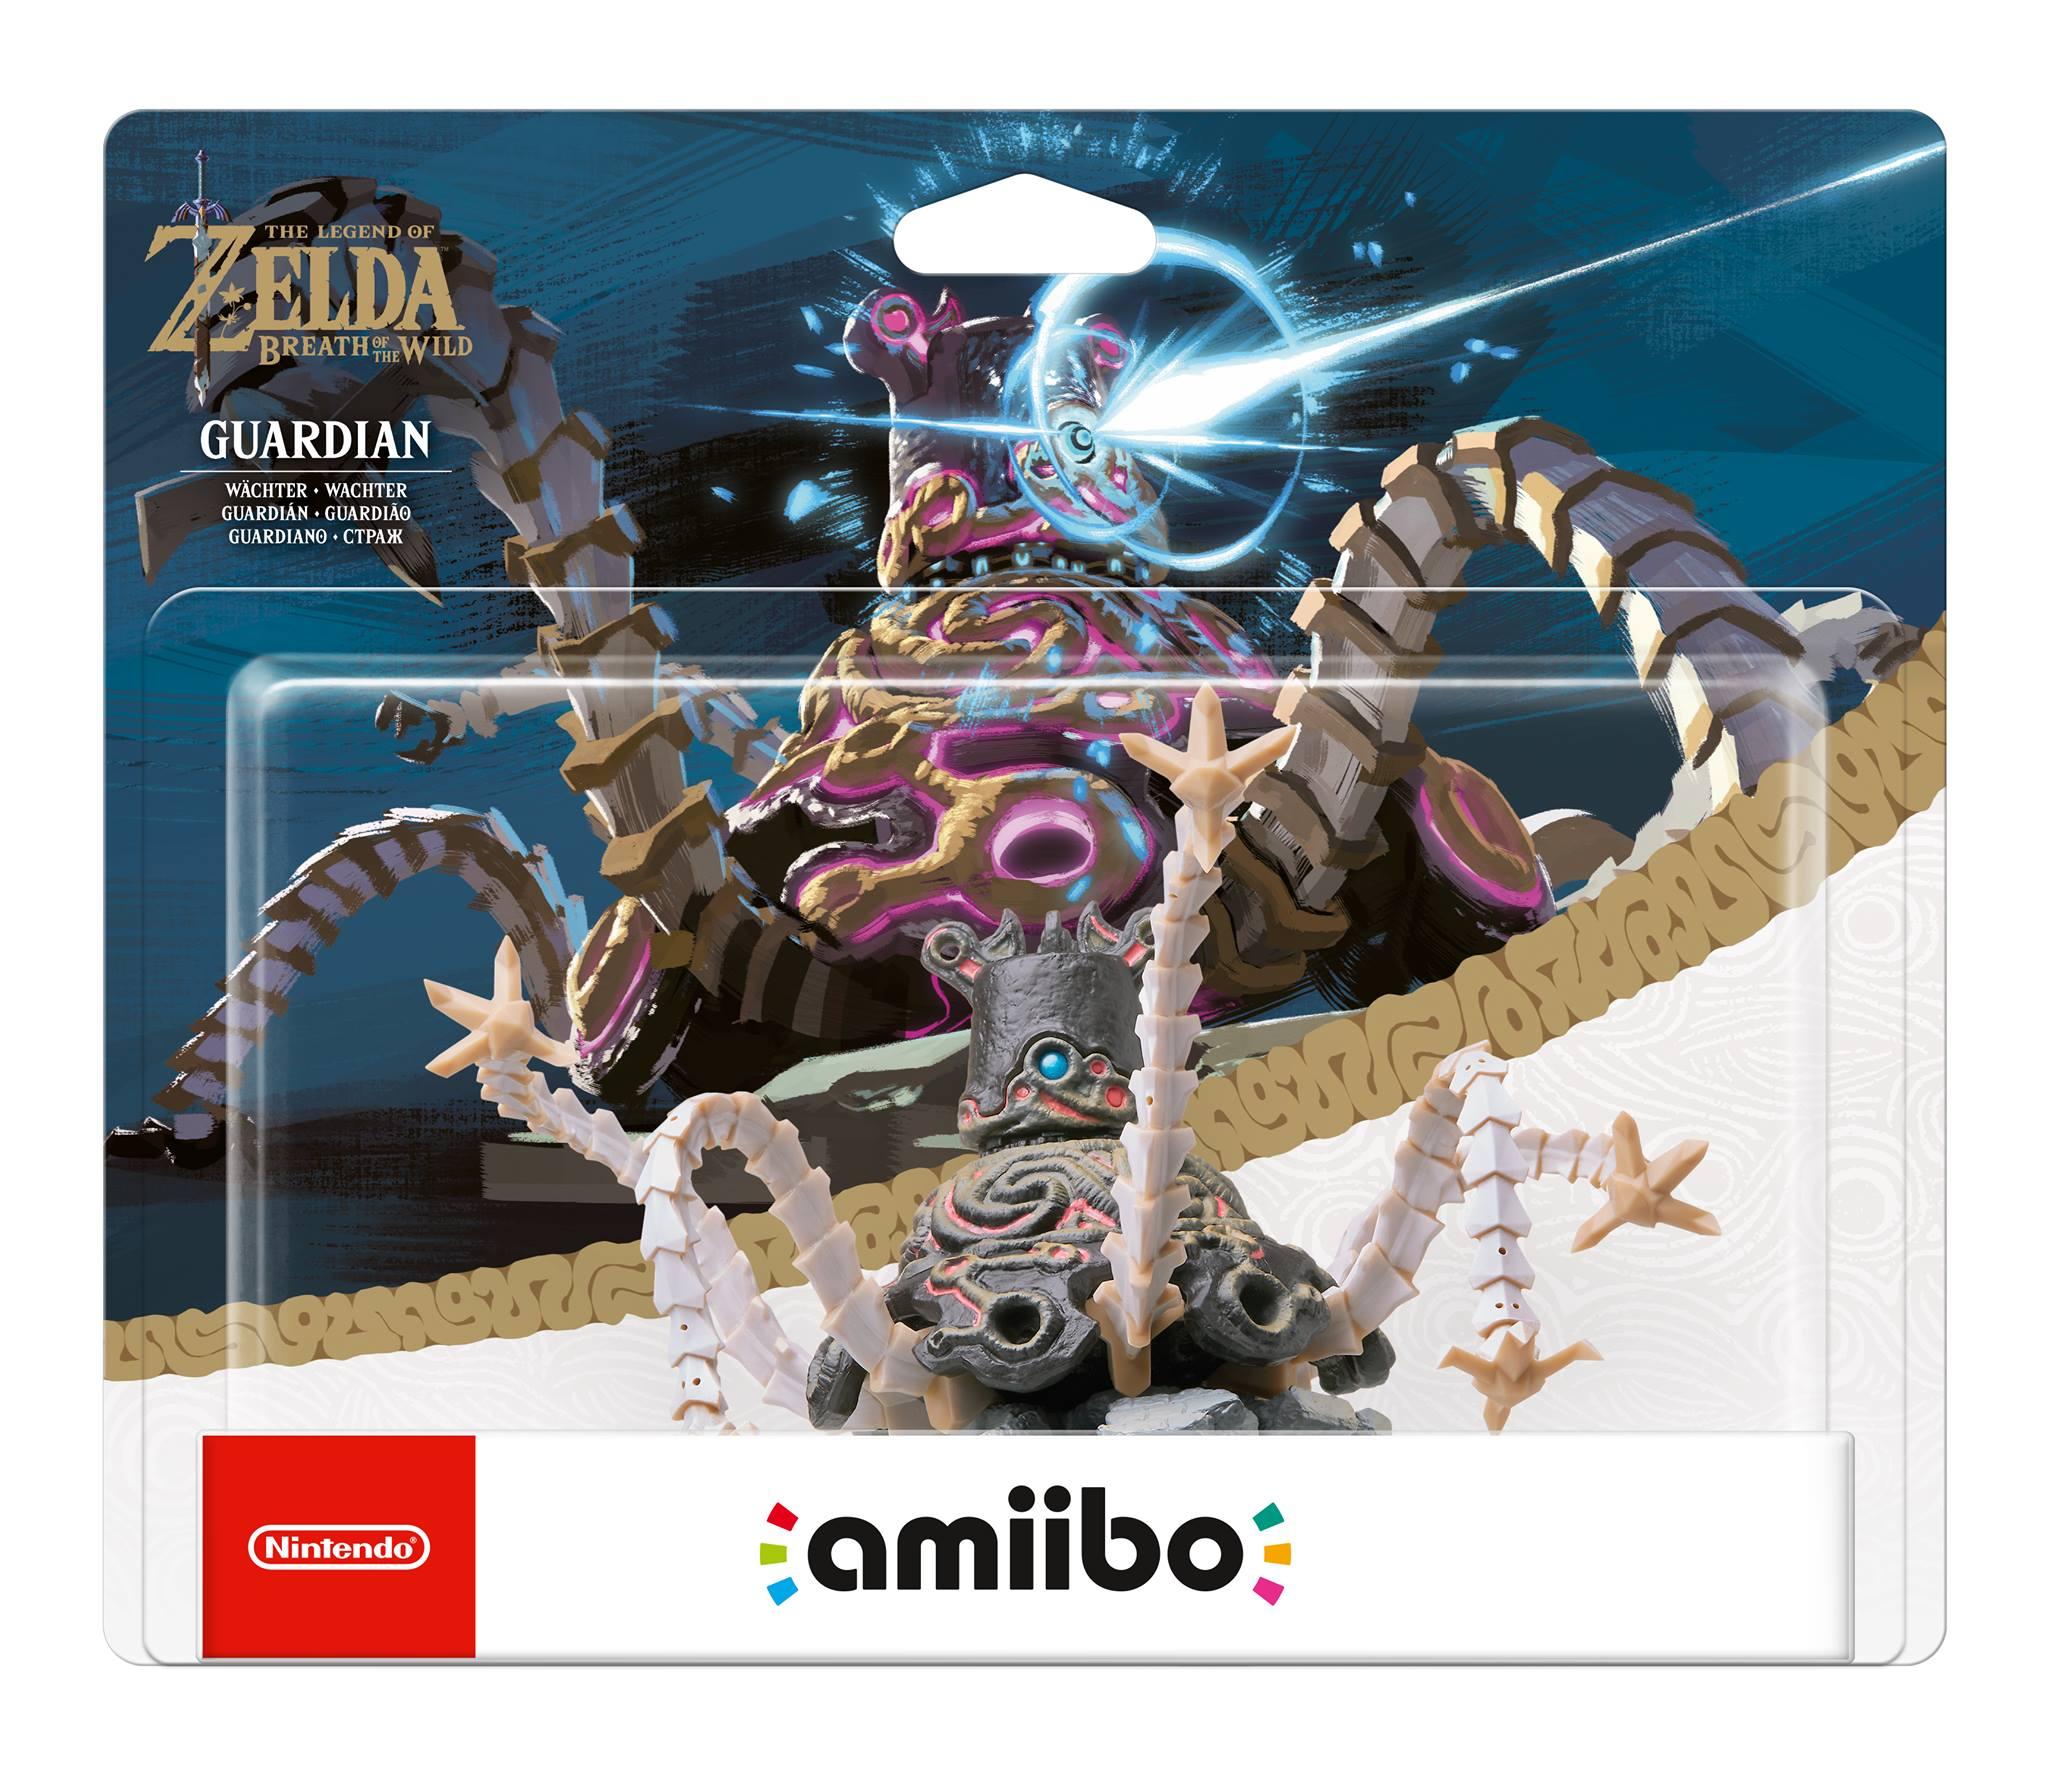 Link a the-legend-of-zelda-breath-of-the-wild-amiibo-nintendo-foto-08